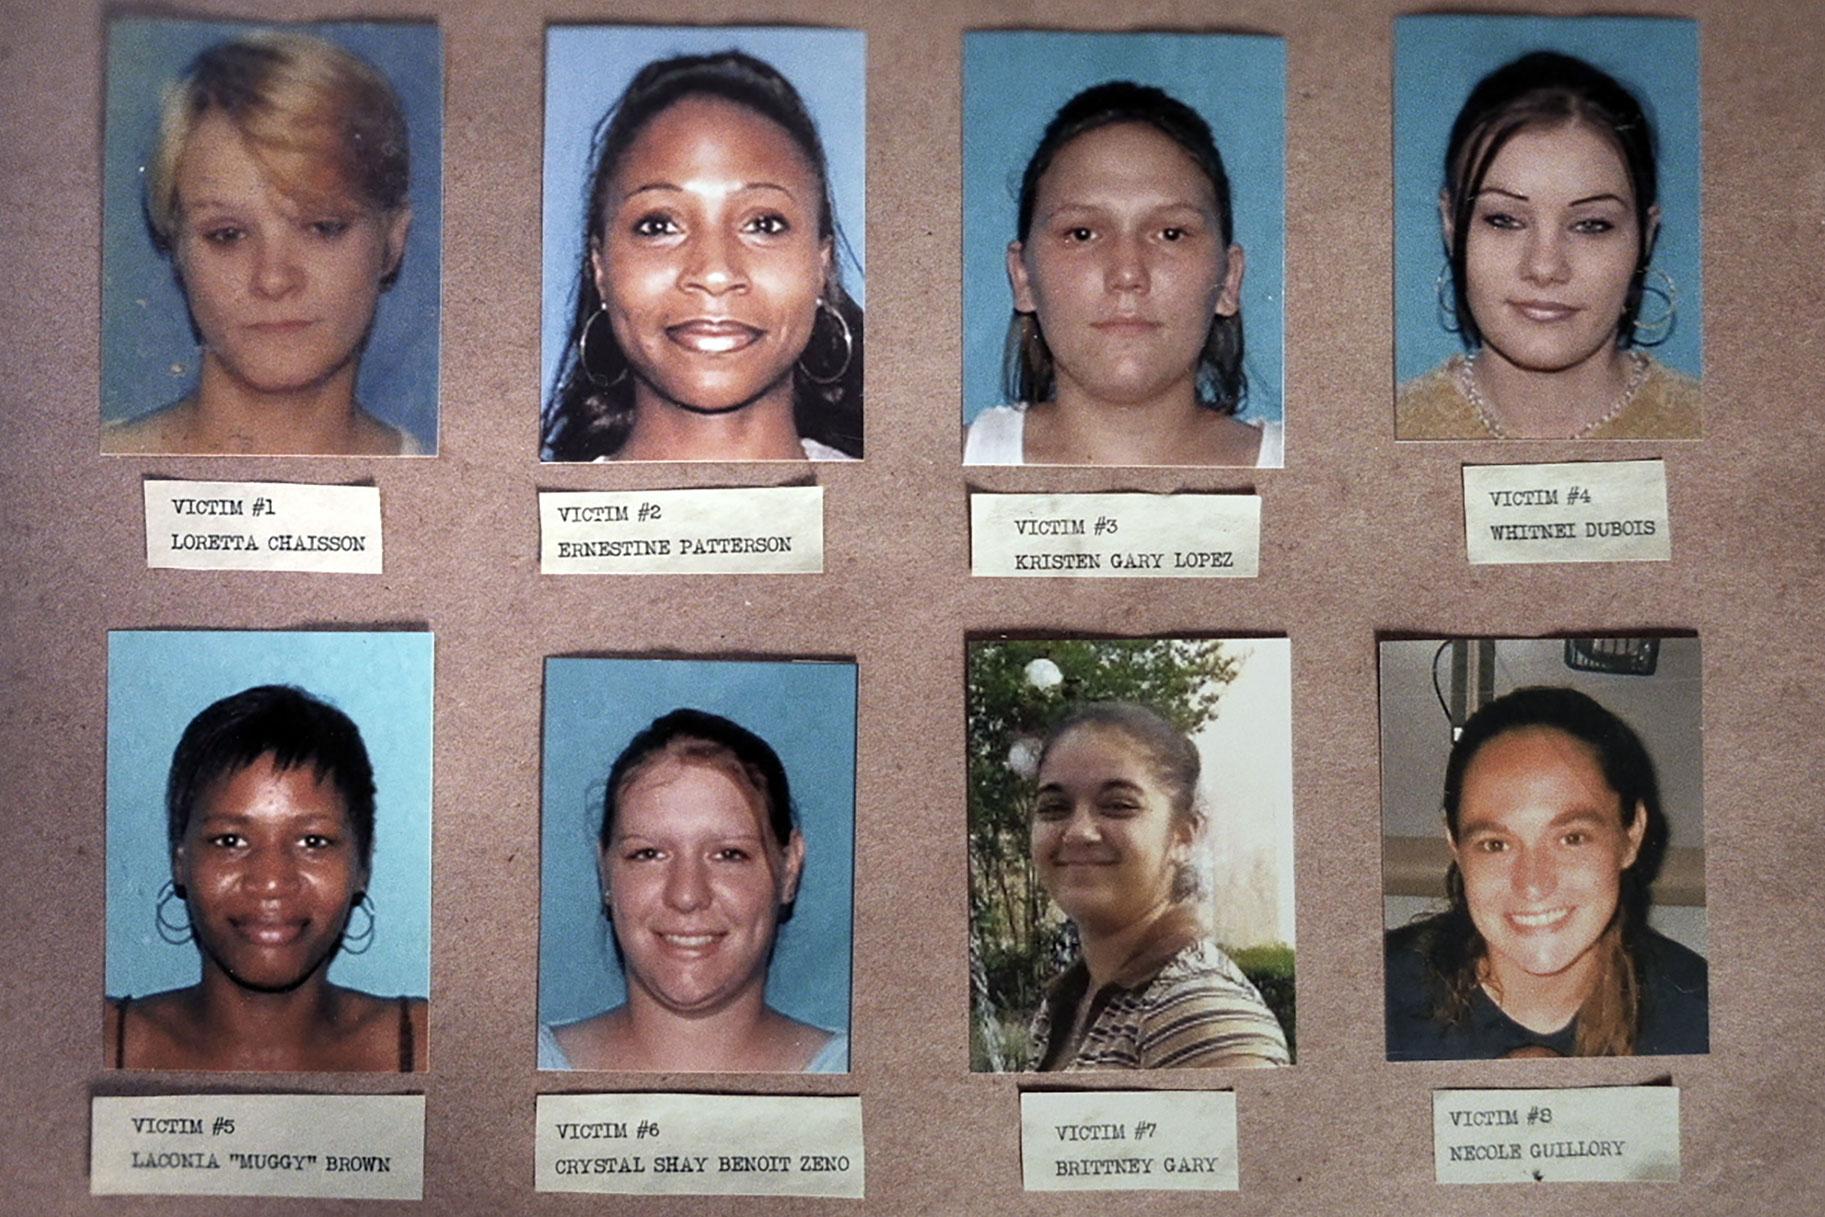 Mungkinkah Kematian Seorang Wanita Lain Berkaitan Dengan Pembunuhan 'Jeff Davis 8' Dalam 'Pembunuhan Di Bayou'?